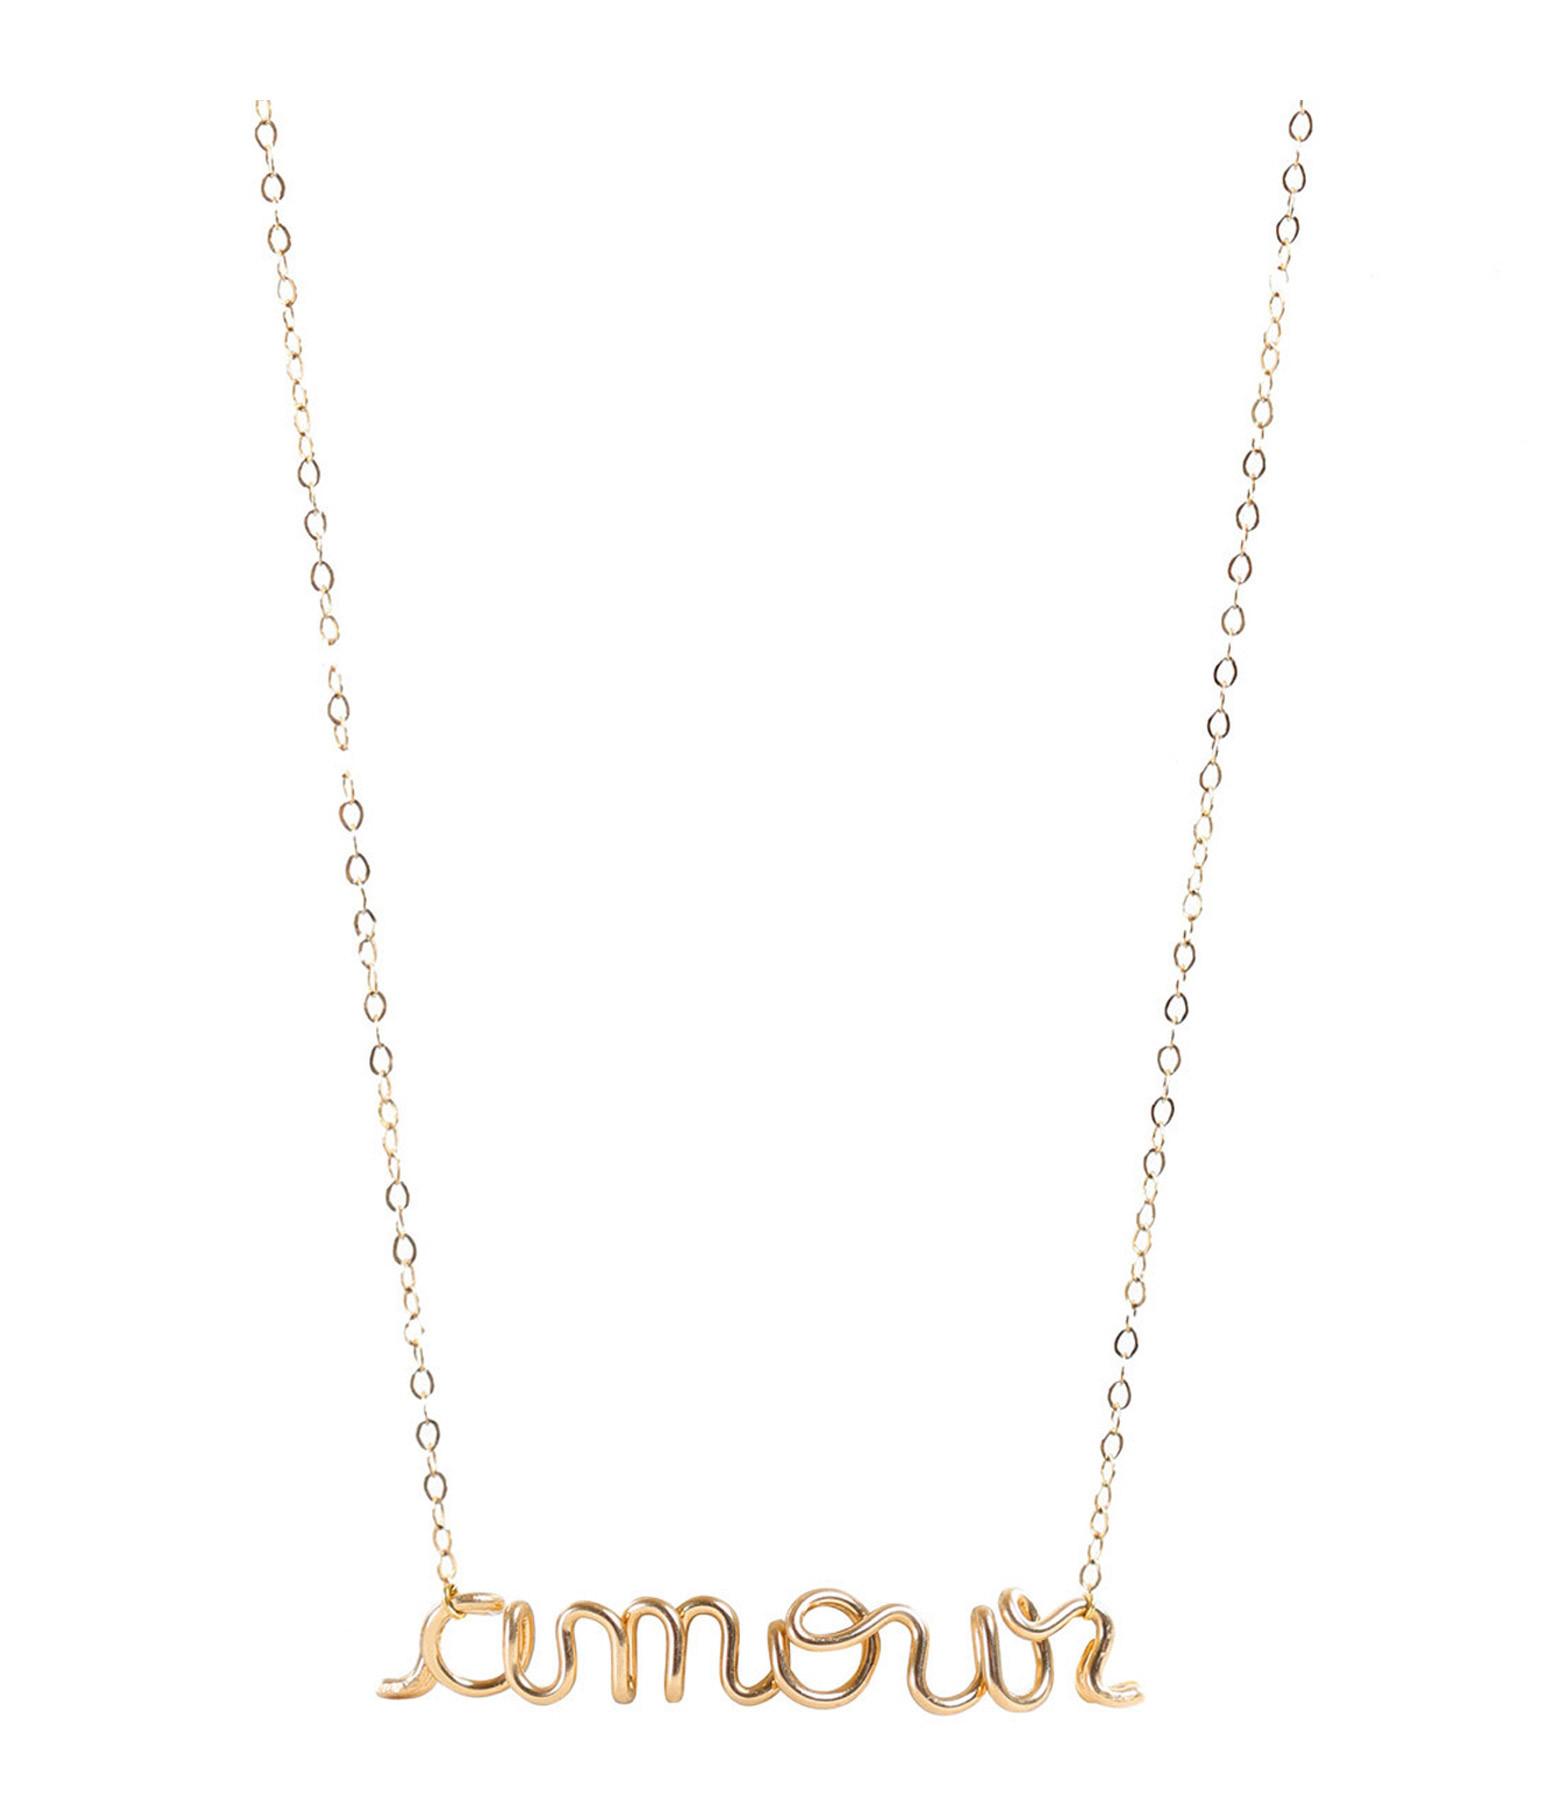 ATELIER PAULIN - Collier Richelieu Amour Gold Filled